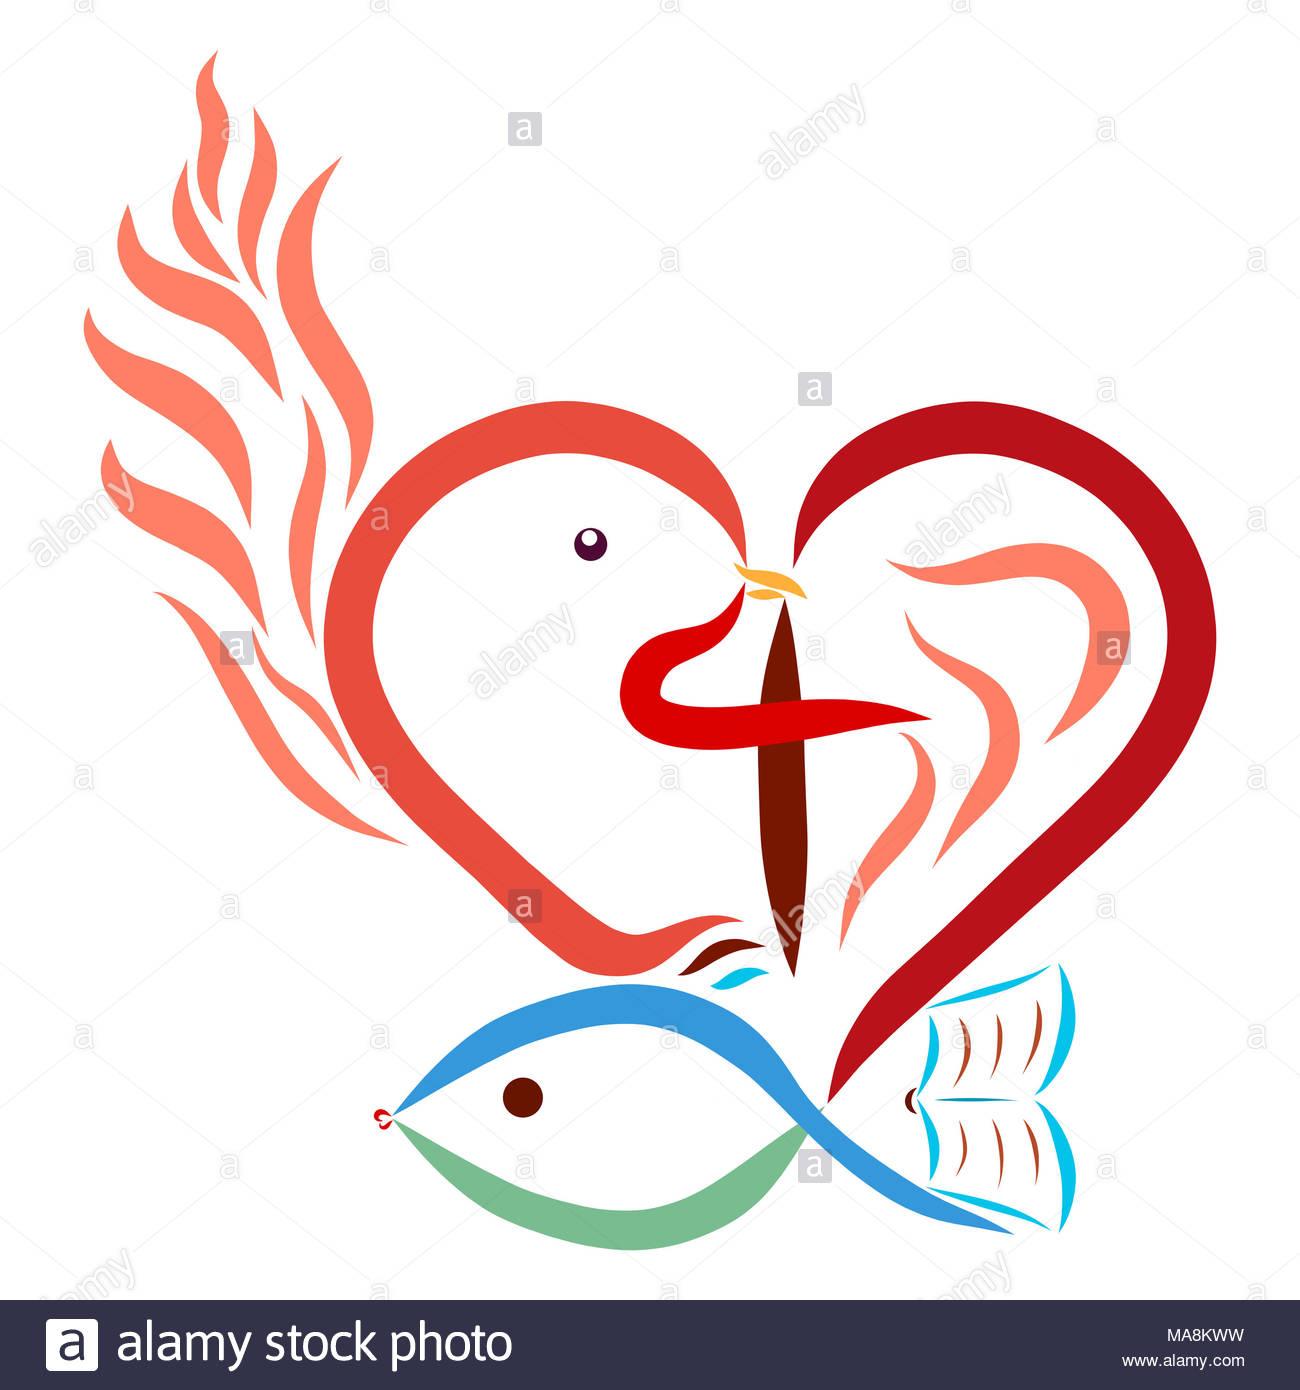 Christian Symbolism Heart Cross Dove Fish Flame Bible Stock